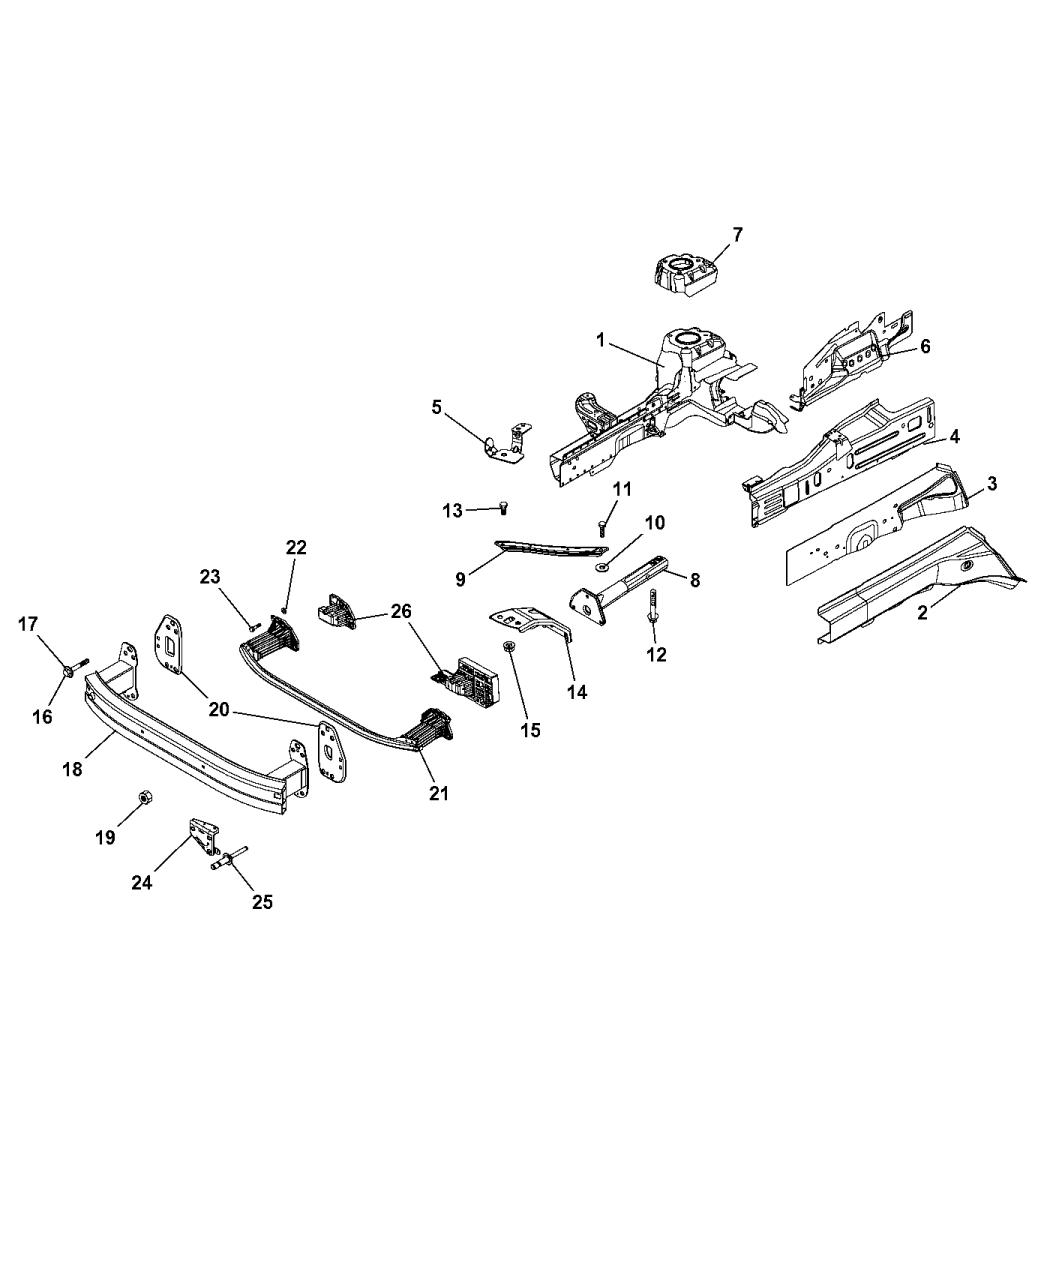 Radiator Fan Wiring Diagram For Jeep Renegade on